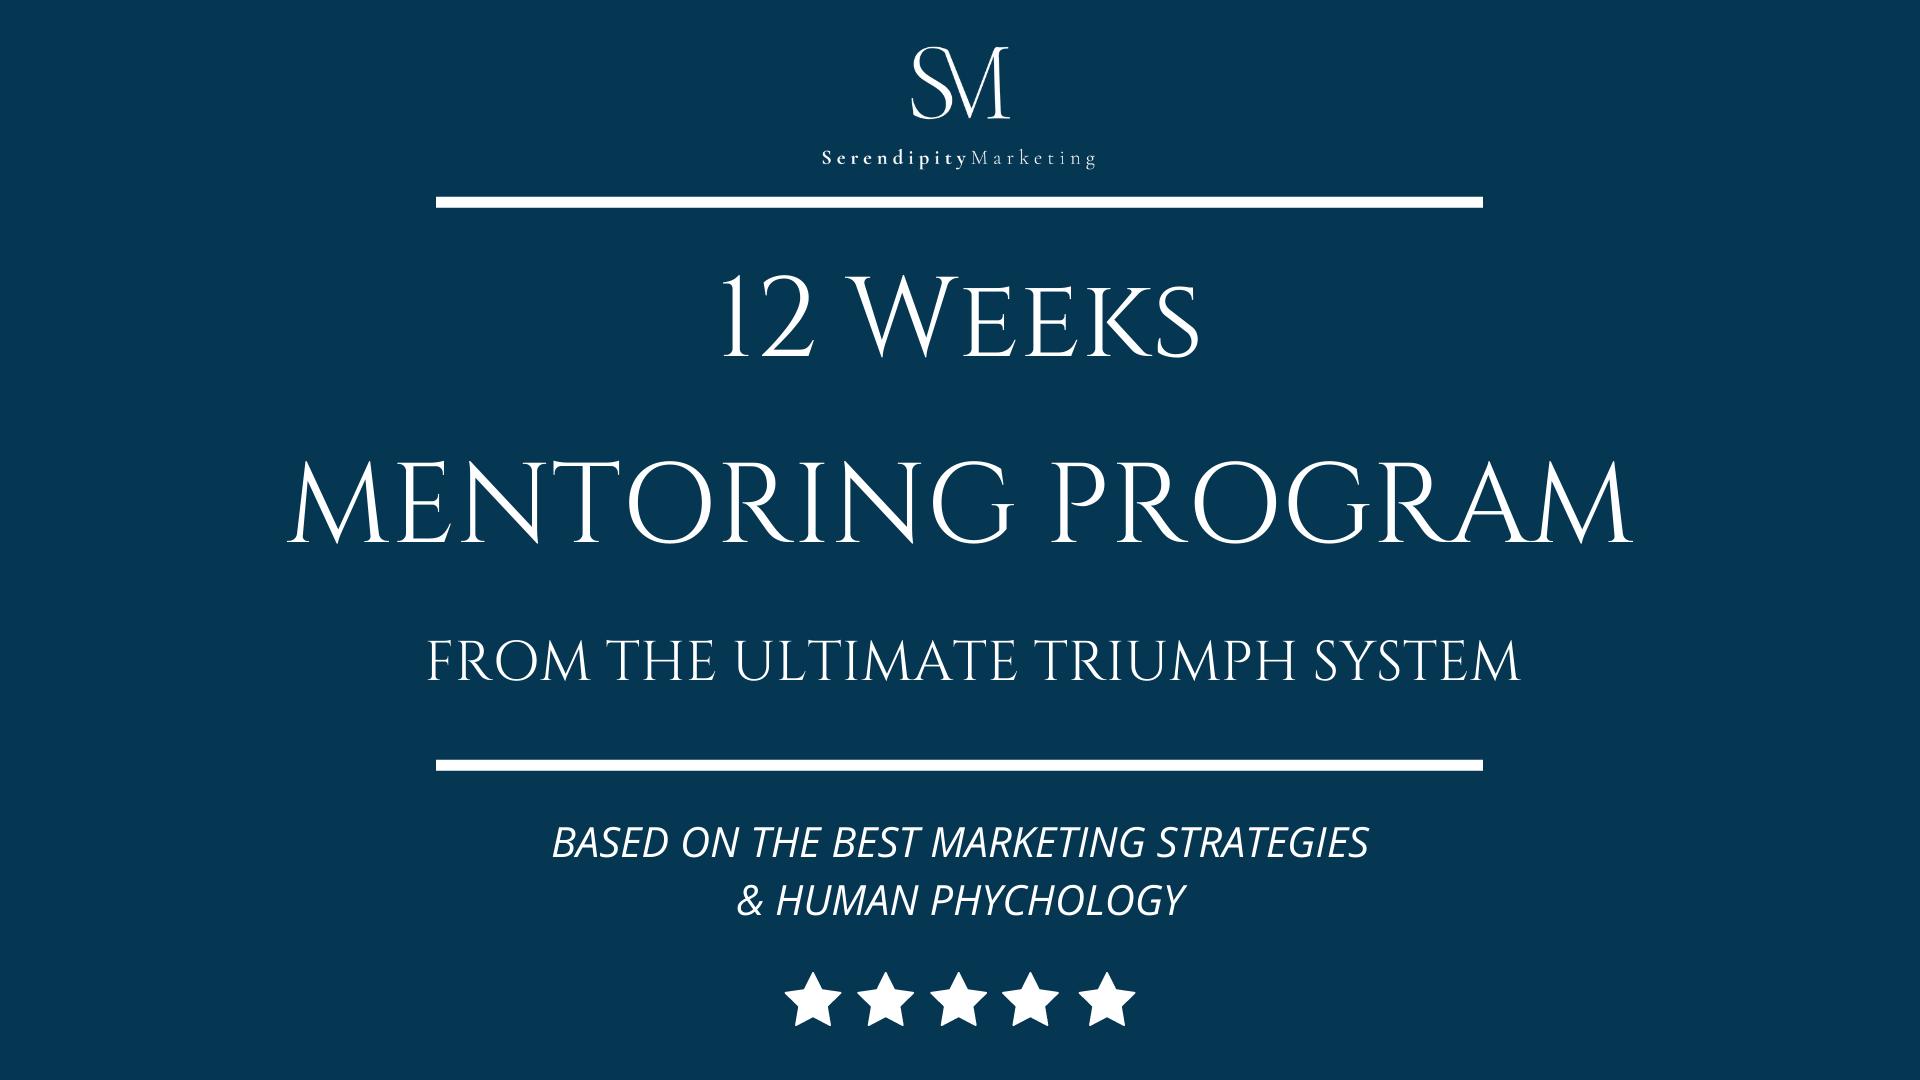 The-Ultimate-Triumph-System-Mentoring-Program